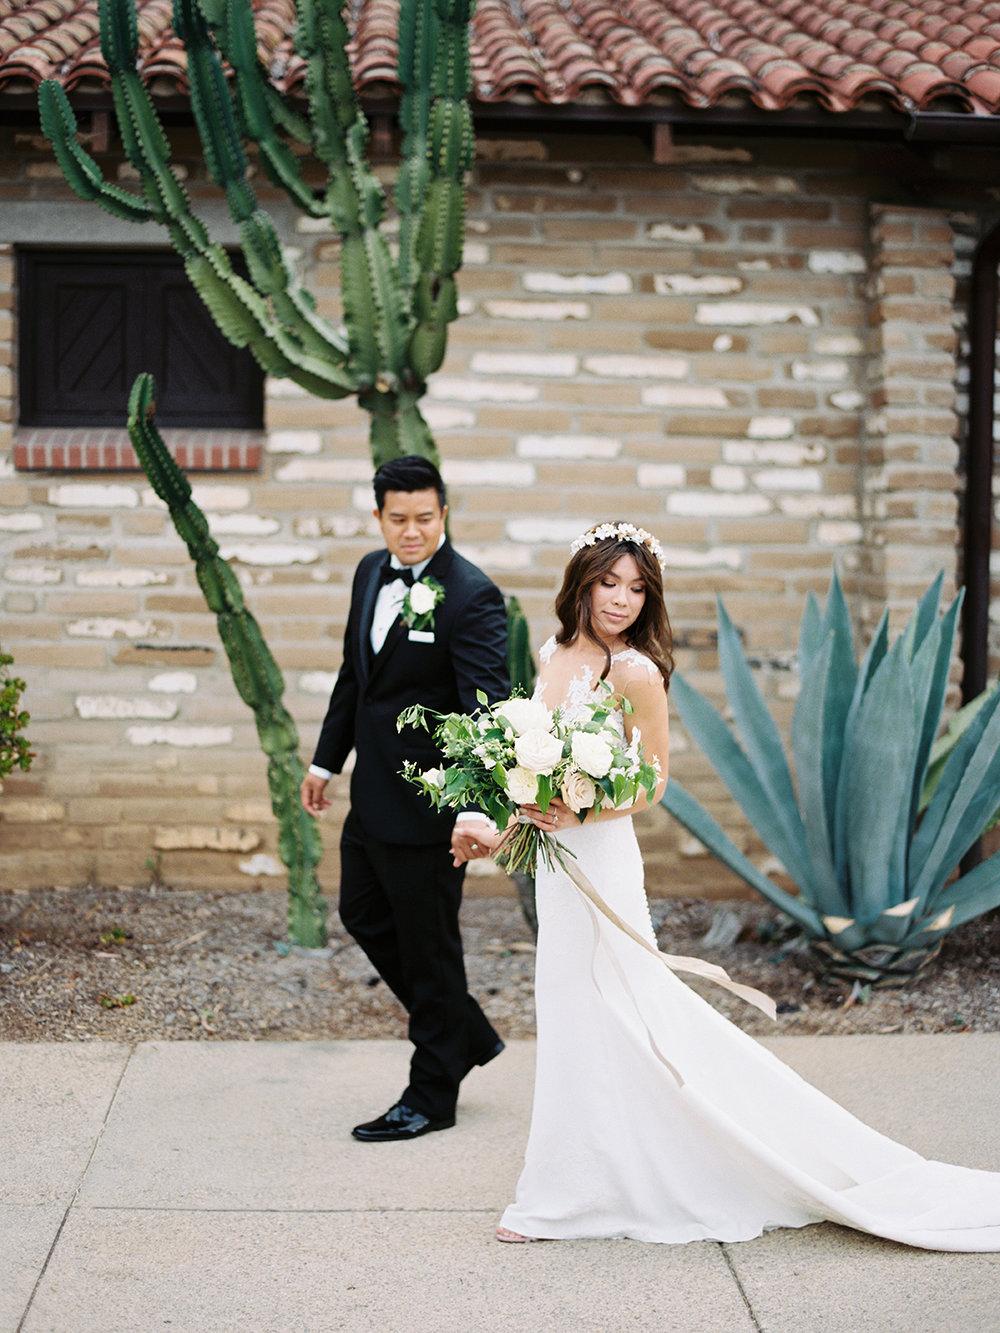 498-phillip-uyen-la-jolla-wedding-fine-art-film-brumley-wells-photography.jpg